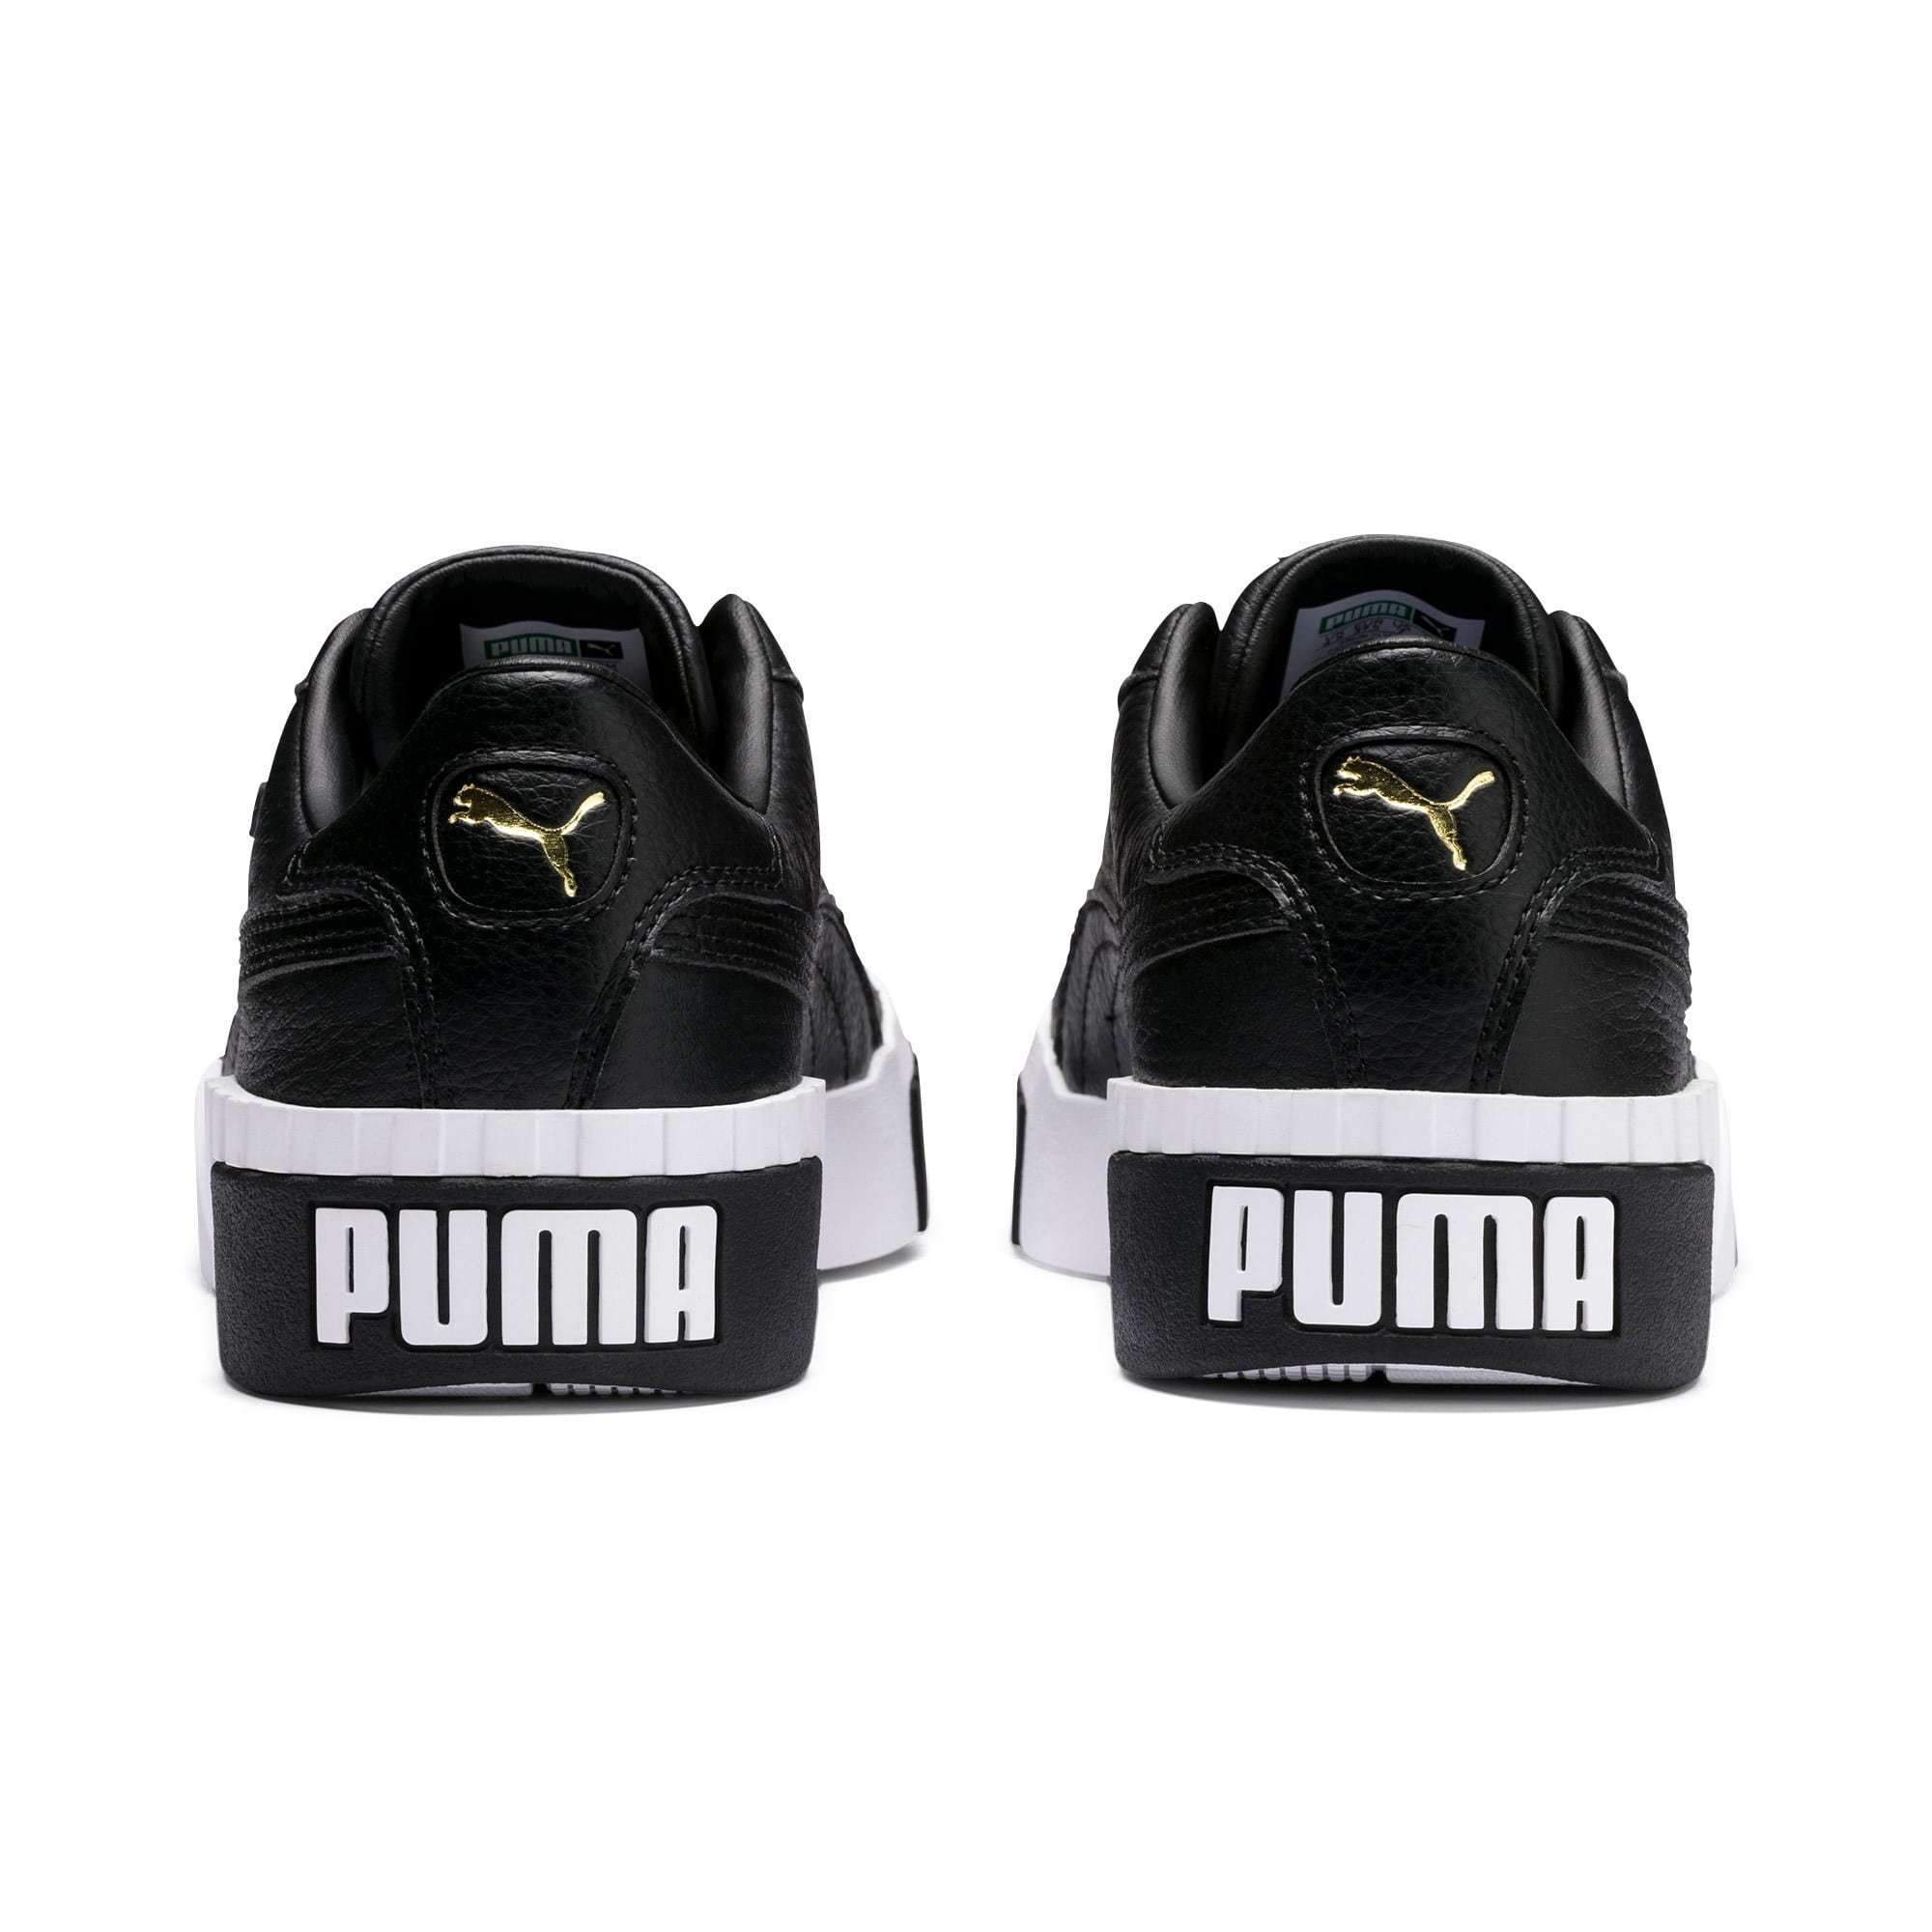 Thumbnail 4 of CALI ウィメンズ, Puma Black-Puma White, medium-JPN